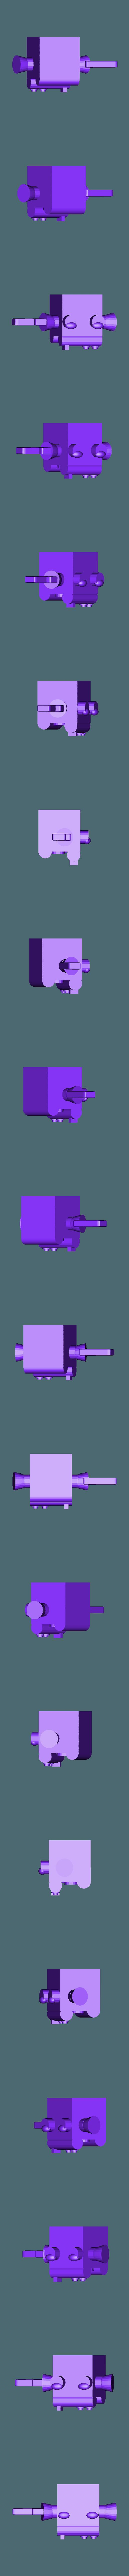 tinker.obj Download free OBJ file 8-Bit Brawl Stars • 3D printer model, paco_egabrum